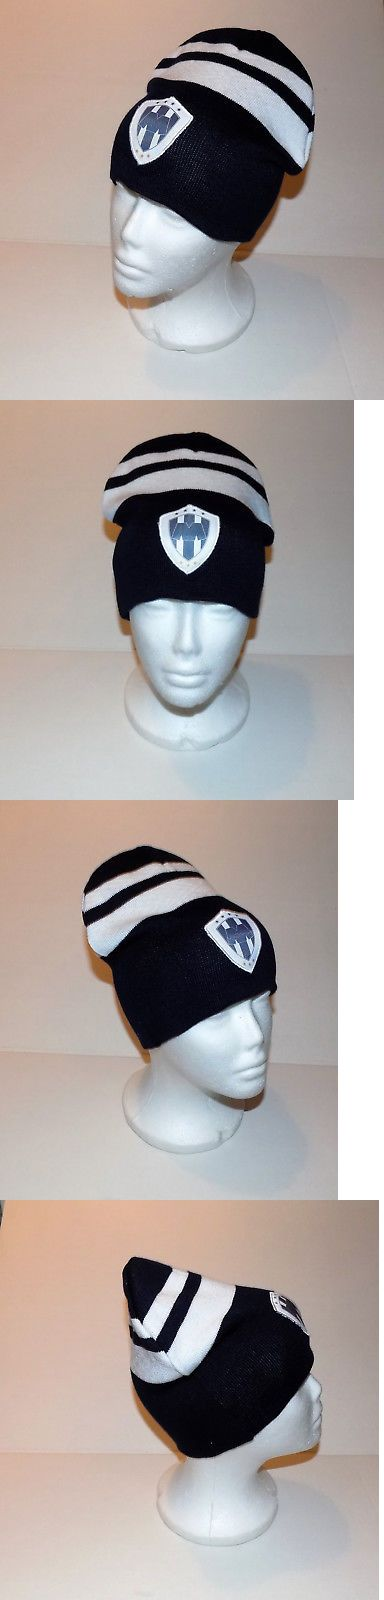 sale retailer d080f 0e099 Hats and Headwear 123876  Rayados De Monterrey Beanie Hat (Gorra Beanie) Mexico  Soccer